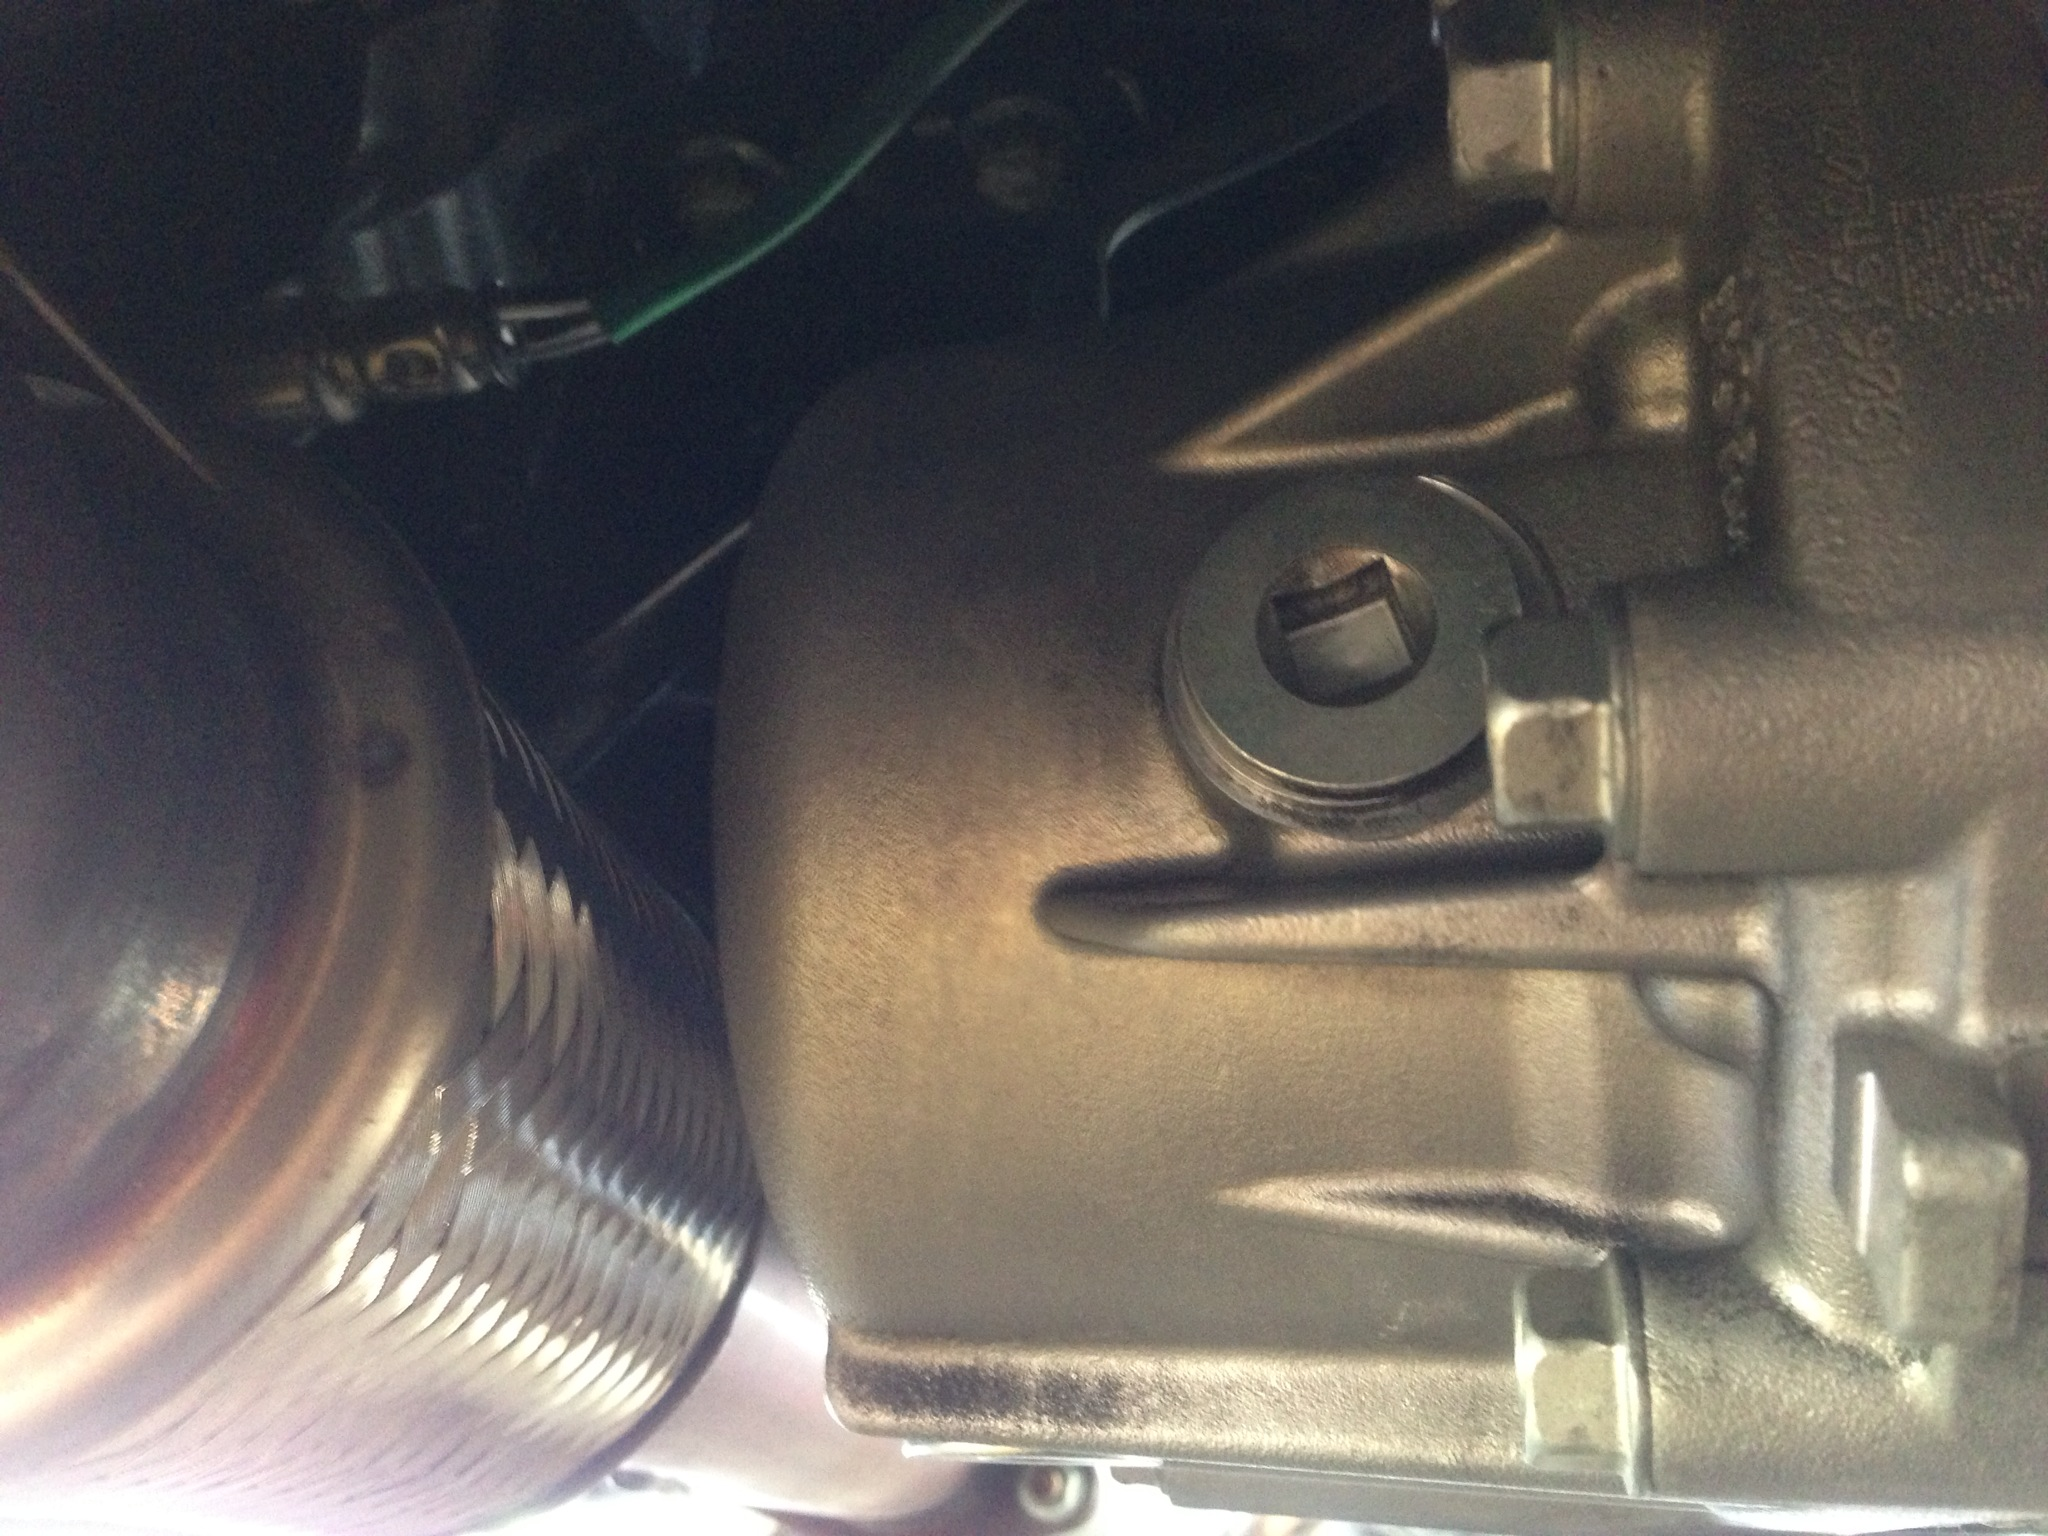 D Mdx Rear Differential Fluid Transfer Case Fluid Image